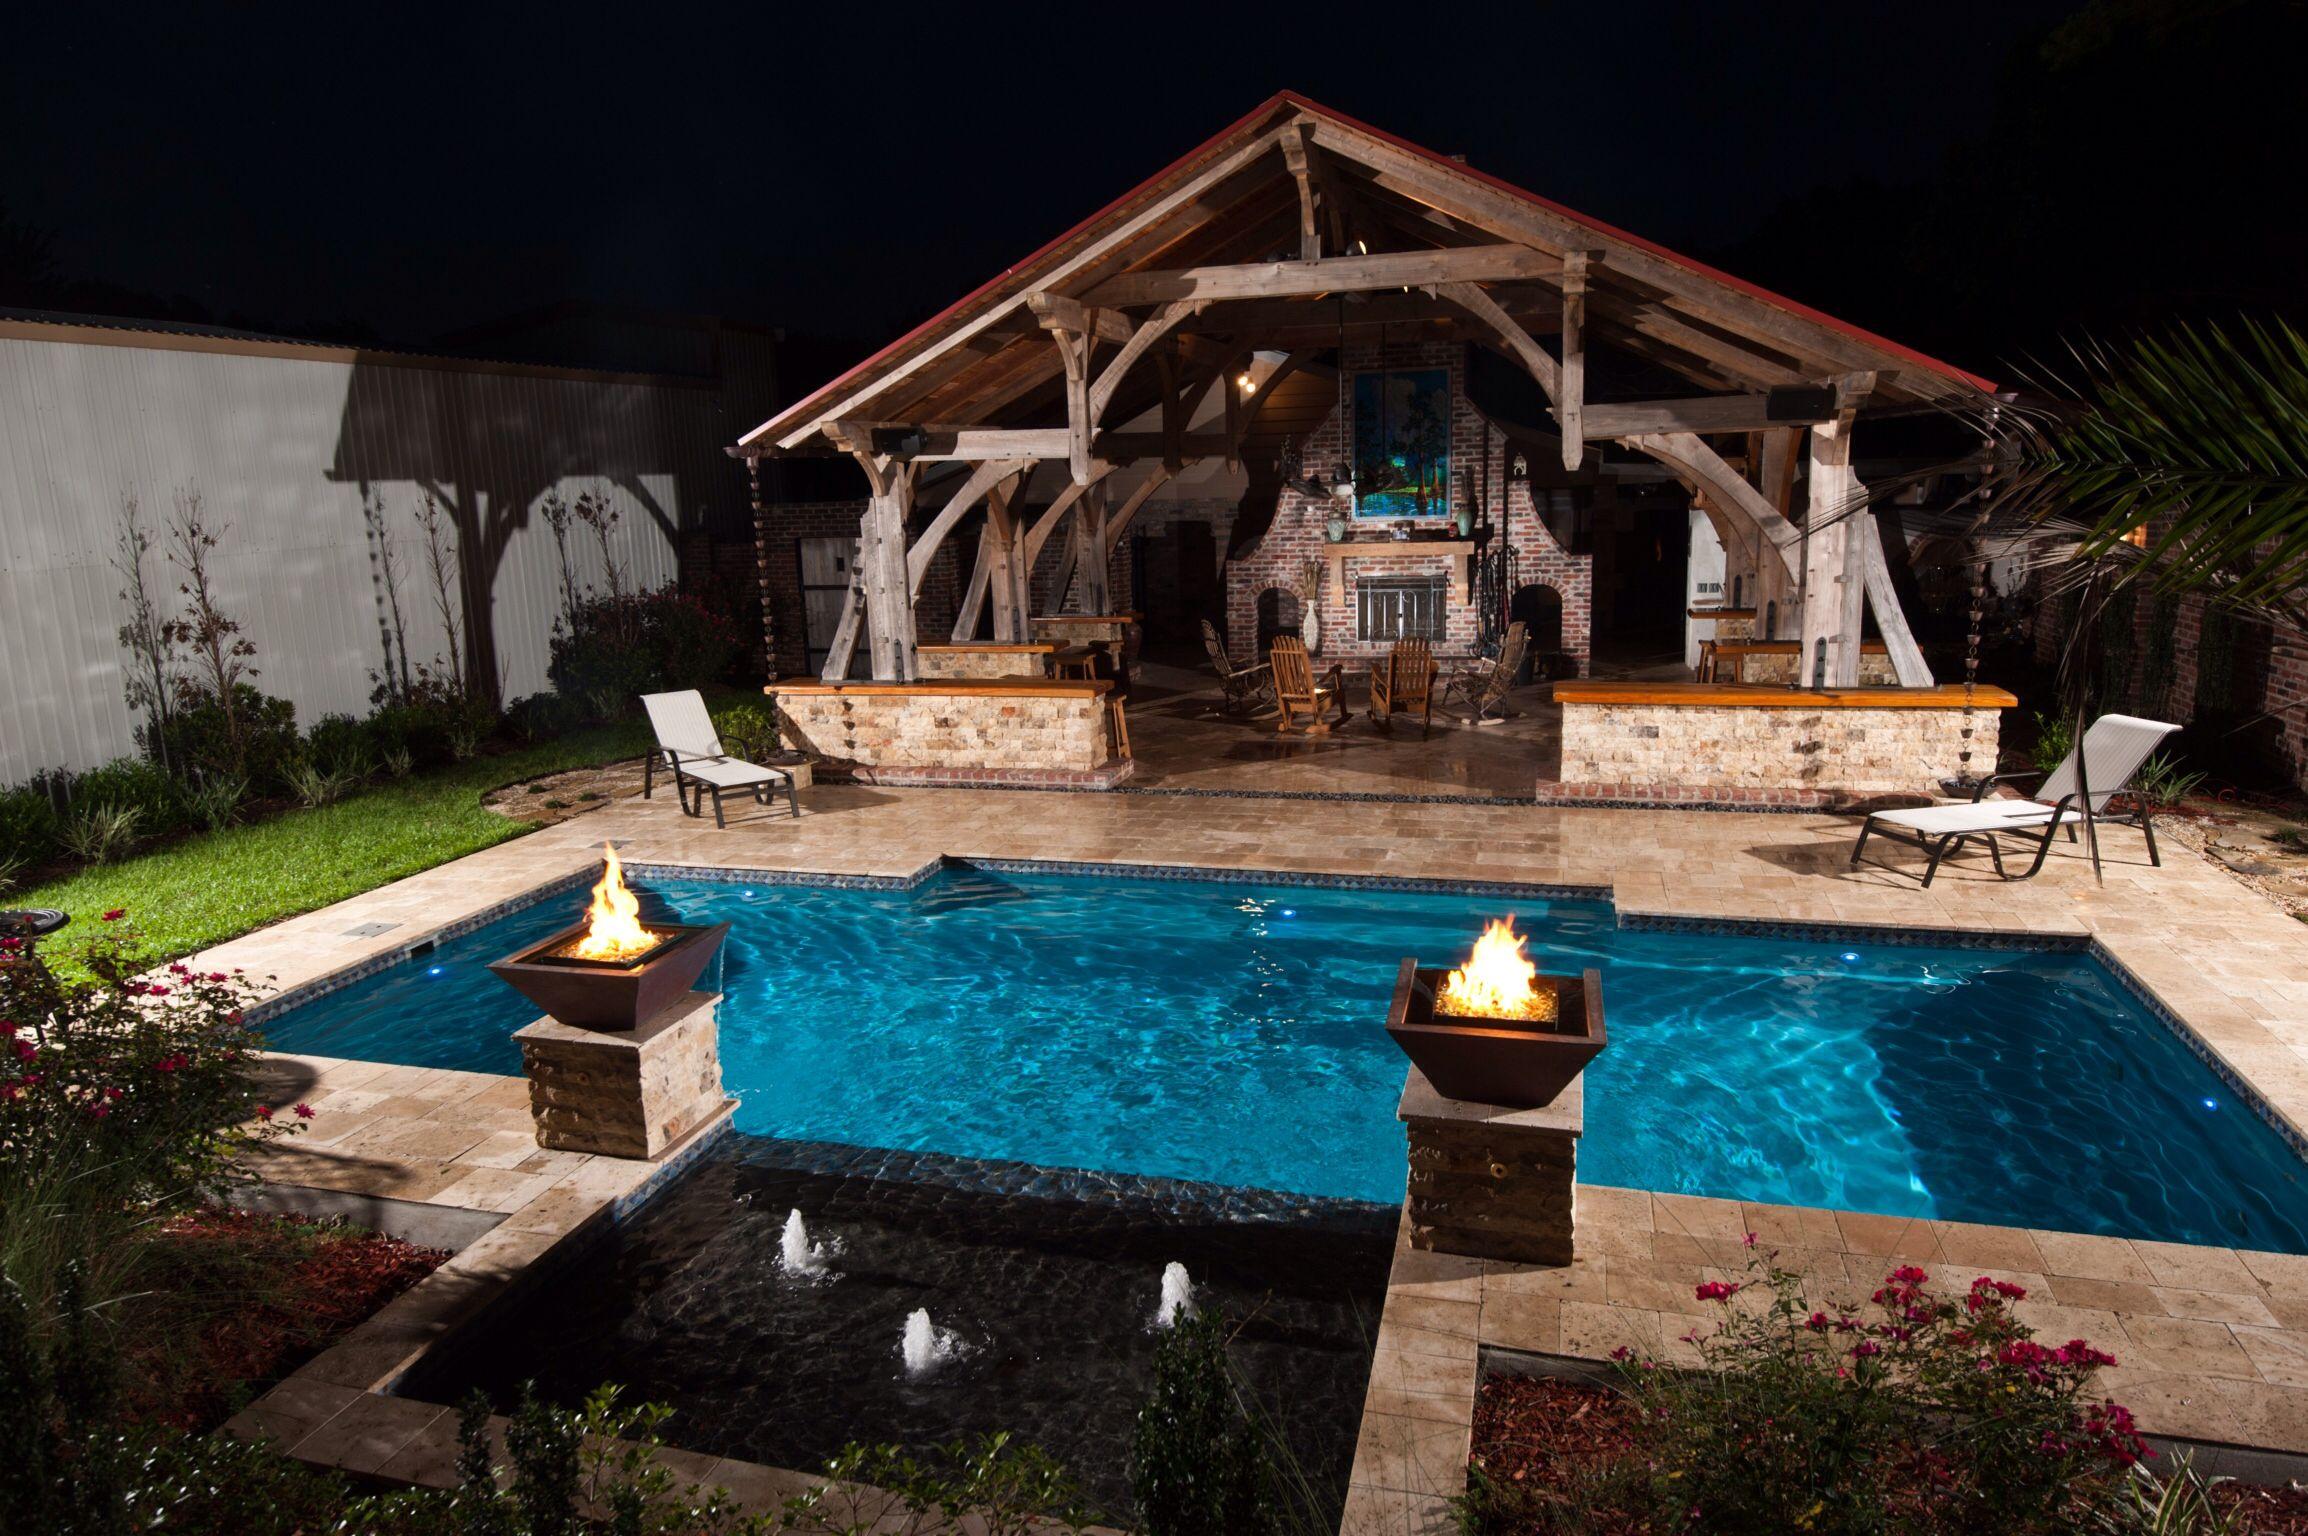 Cajun Pool Amp Spas Www Cajunpoolsandspas Com Spa Pool Outdoor